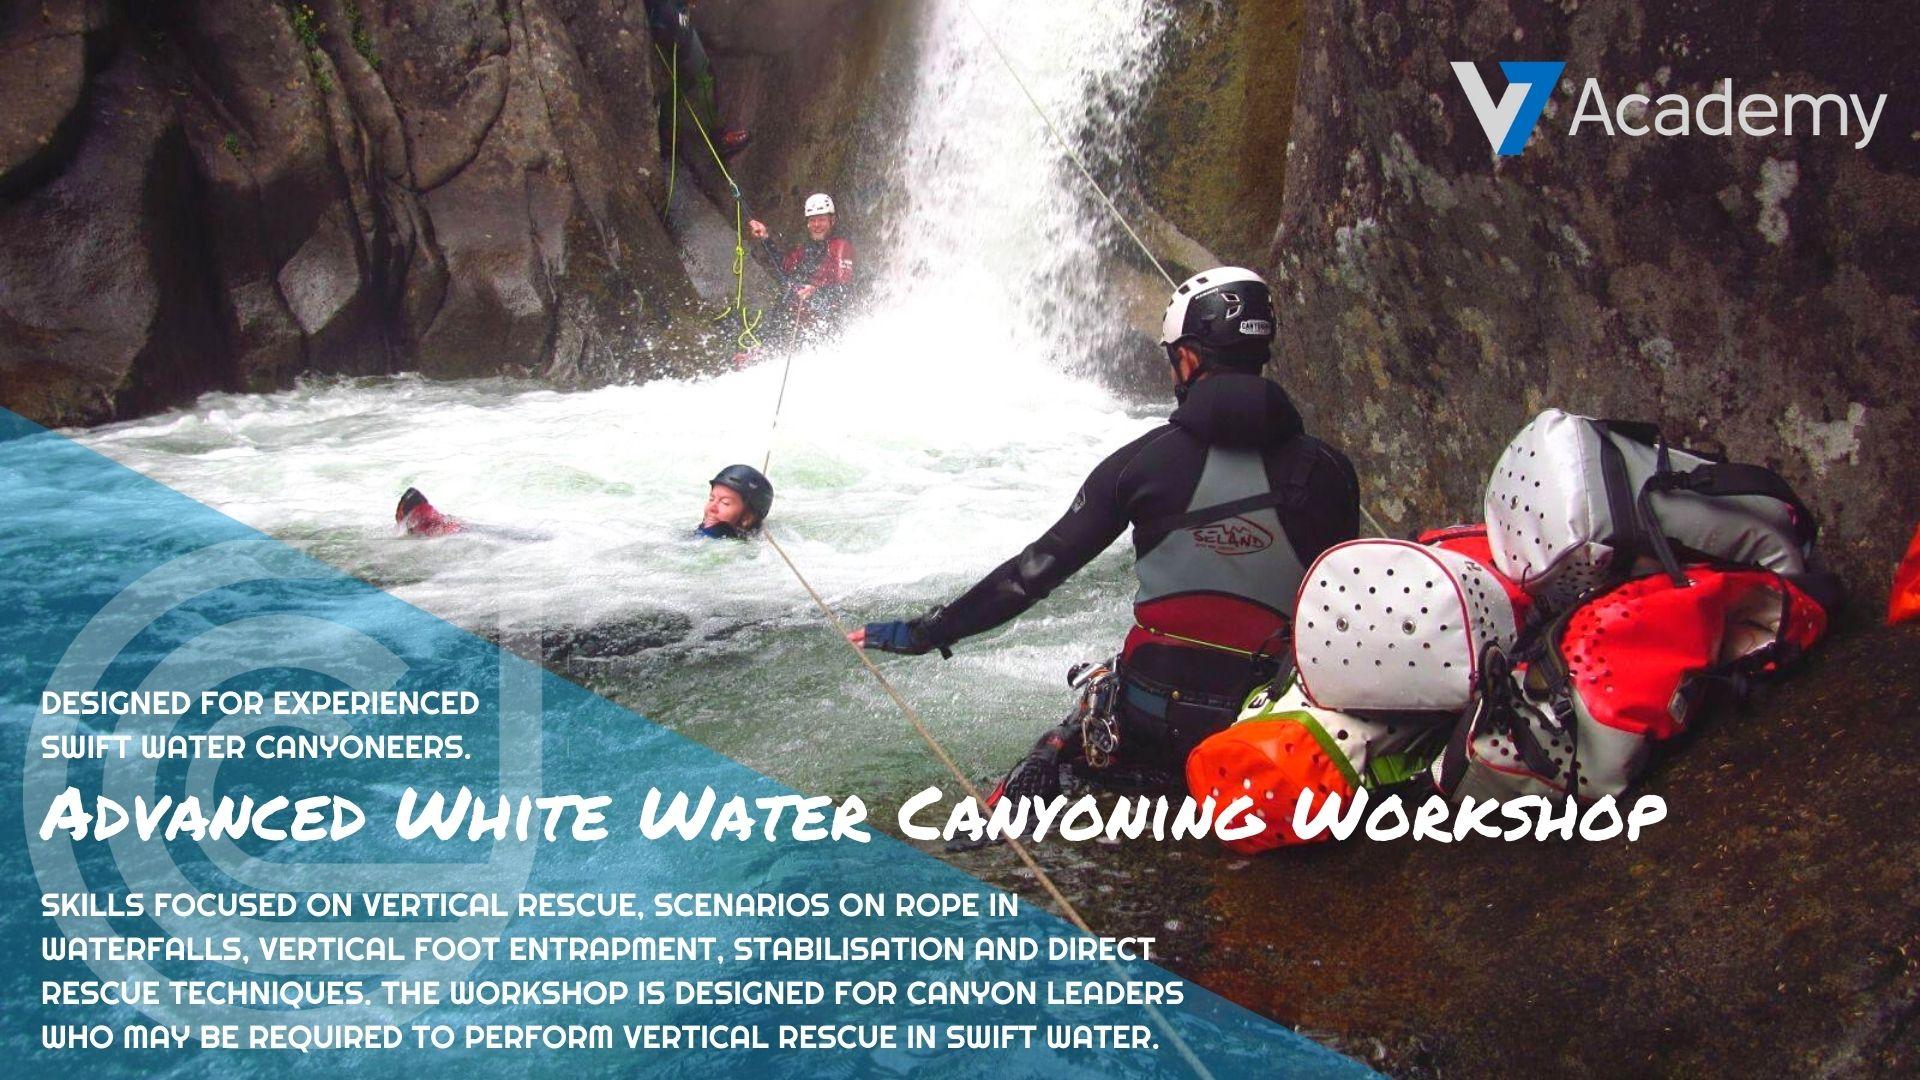 advanced white water canyoning training workshop